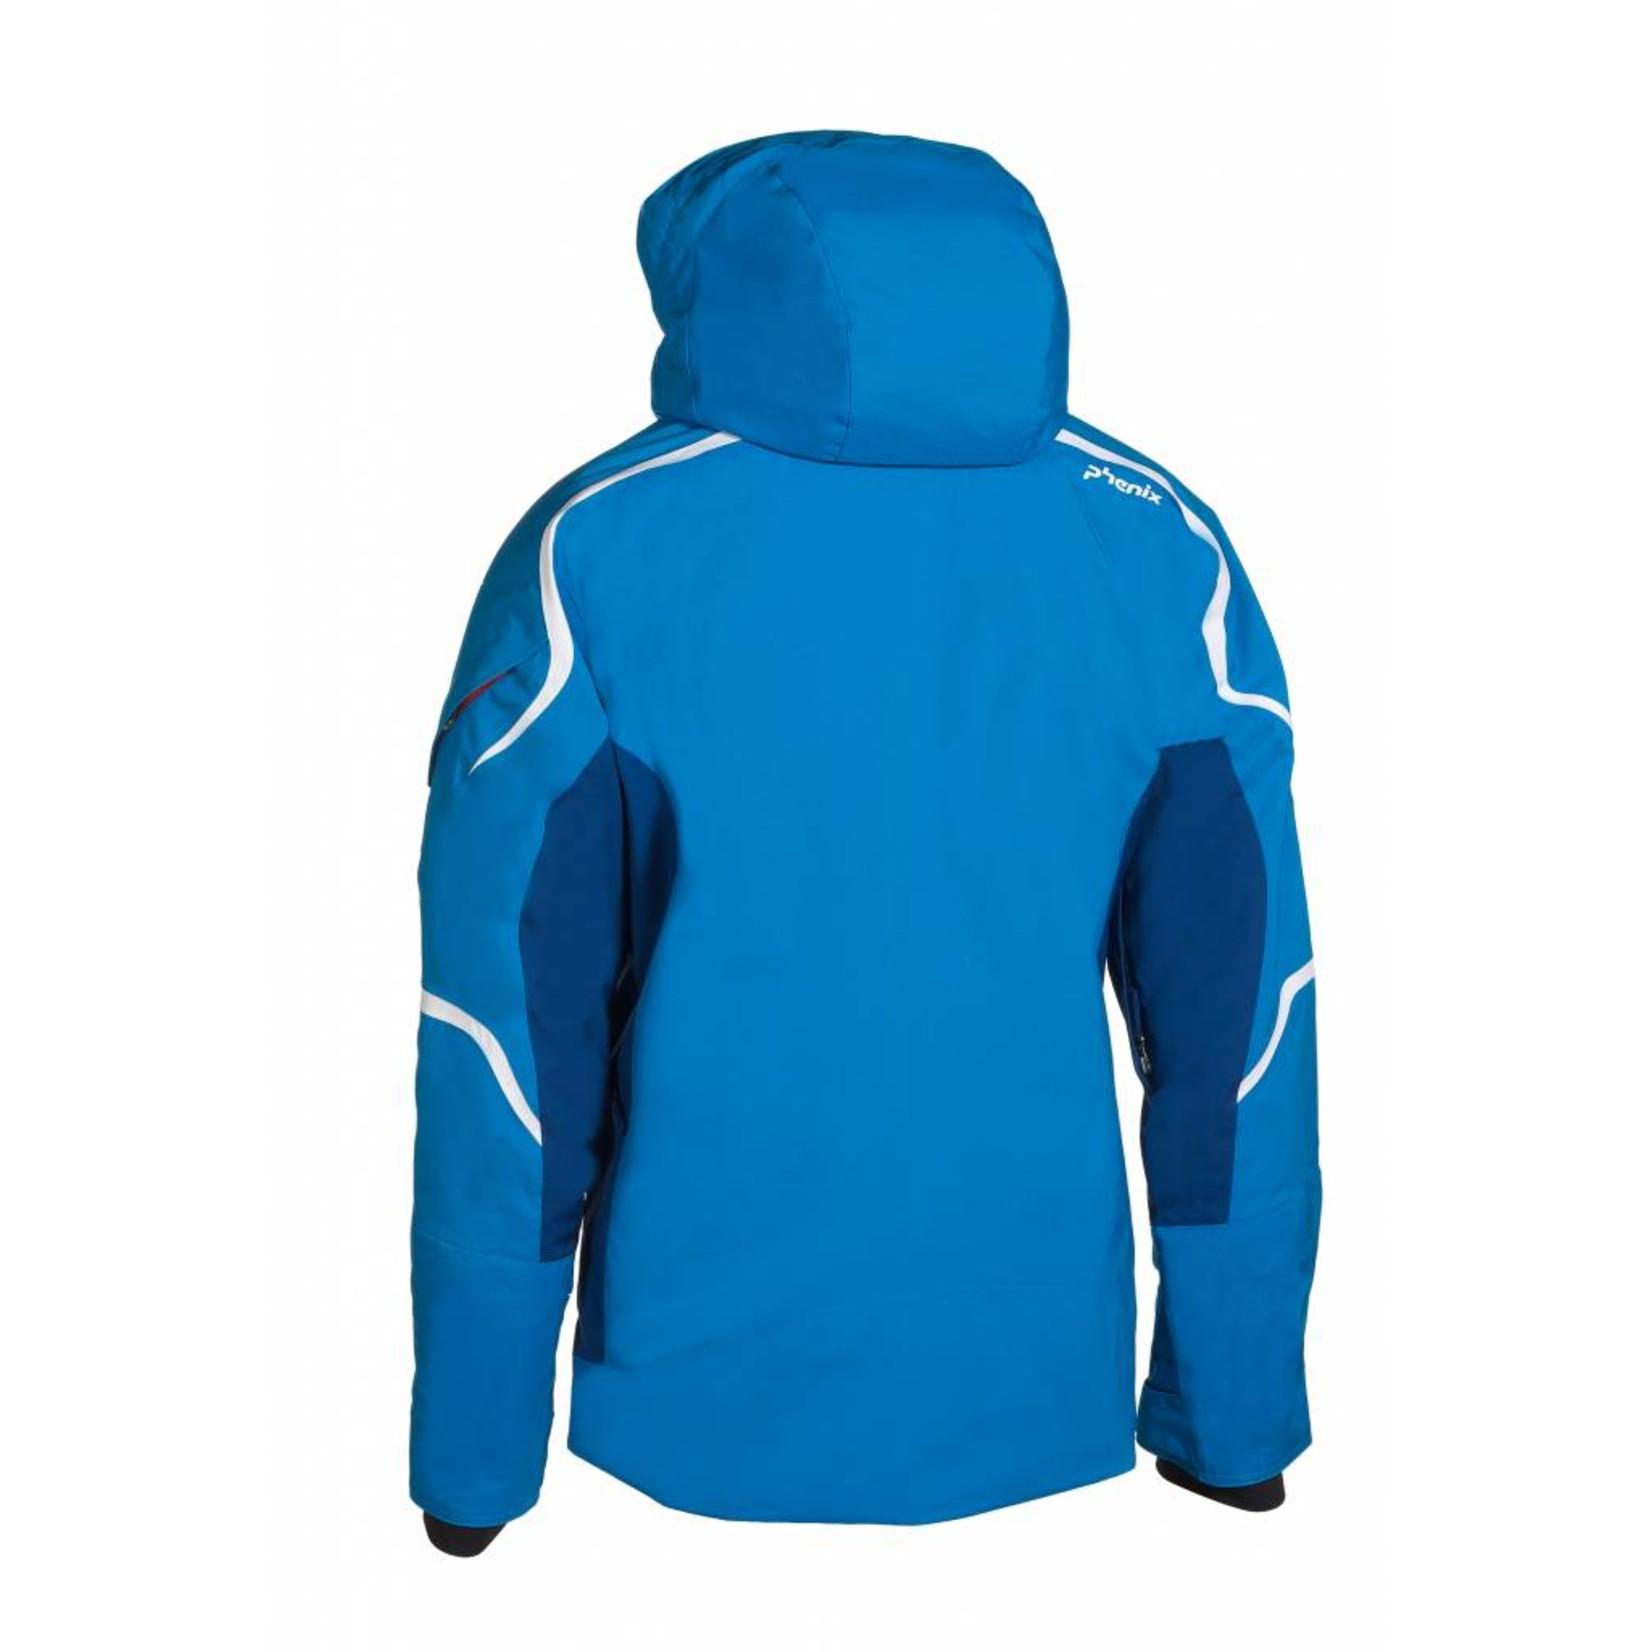 PHENIX Horizon Jacket - BL